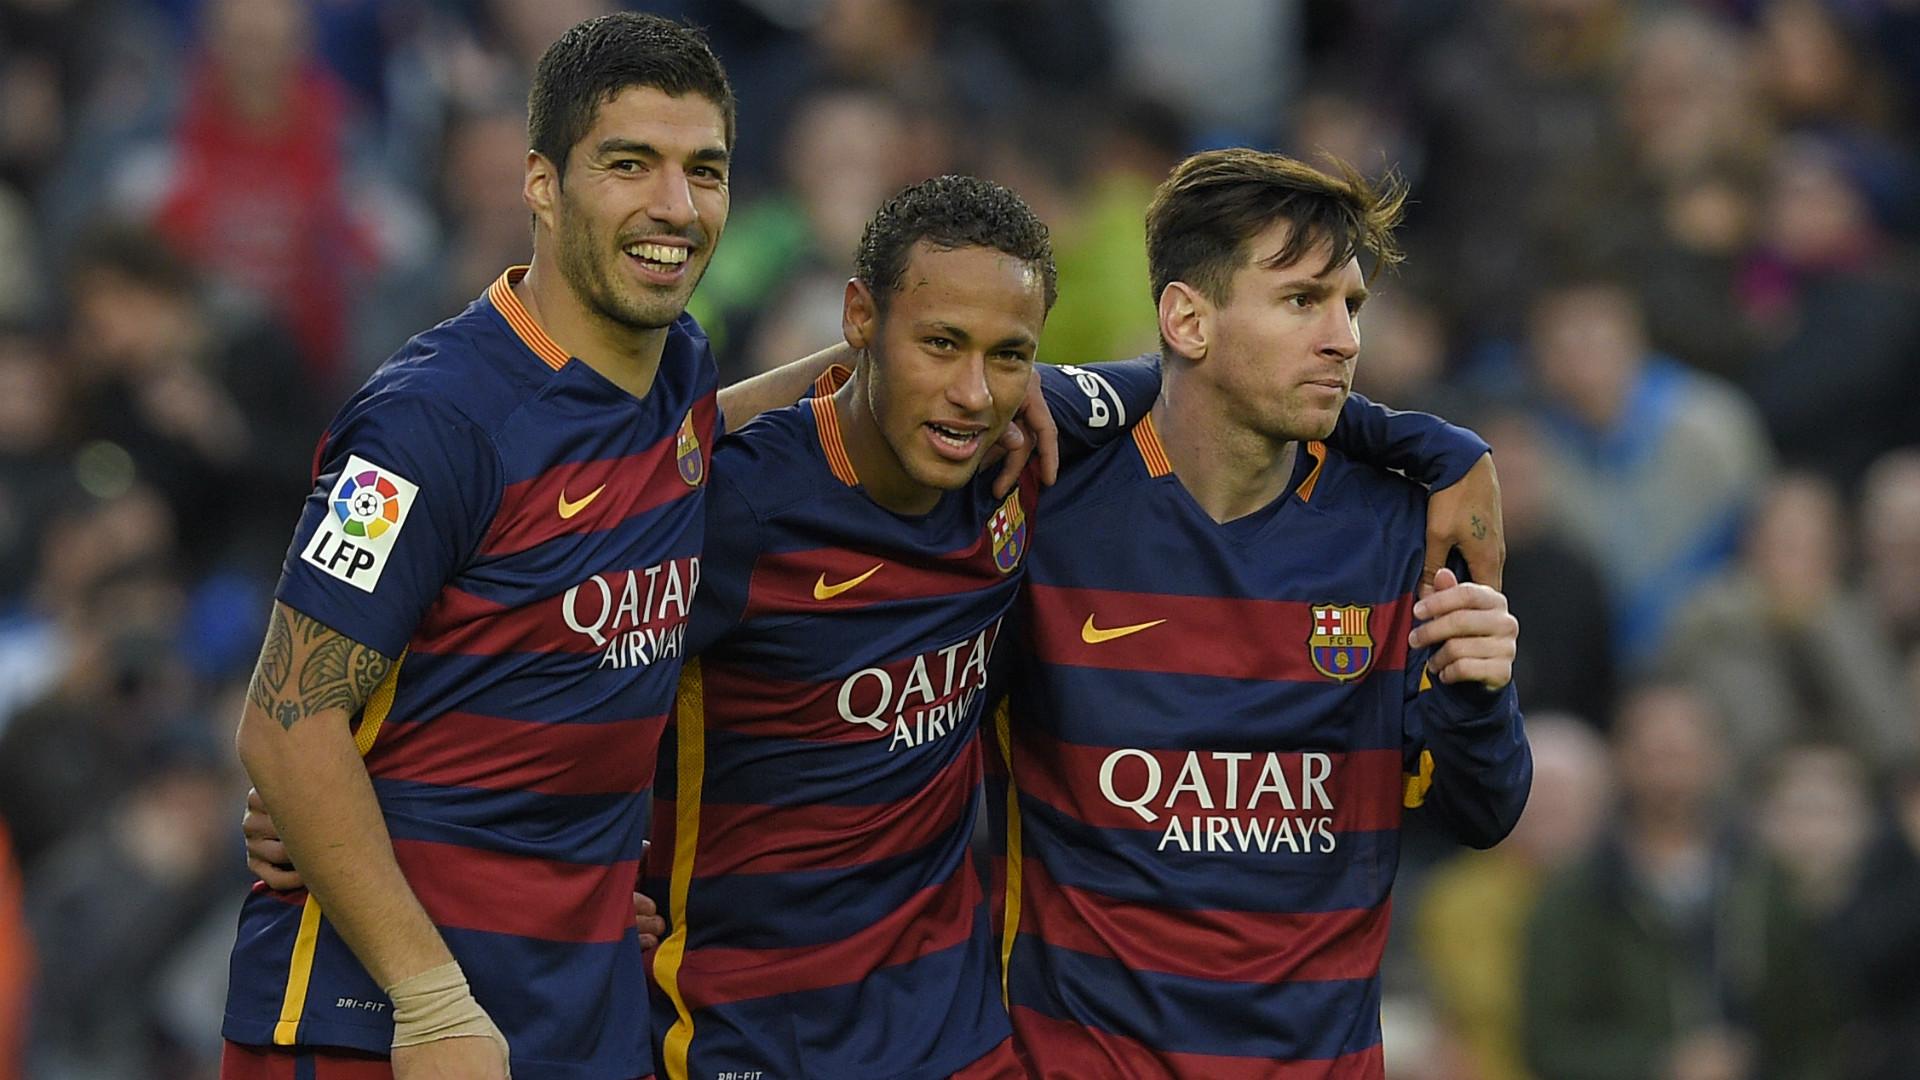 Football | Barcelona forward Neymar: MSN for Ballon d'Or podium | SPORTAL